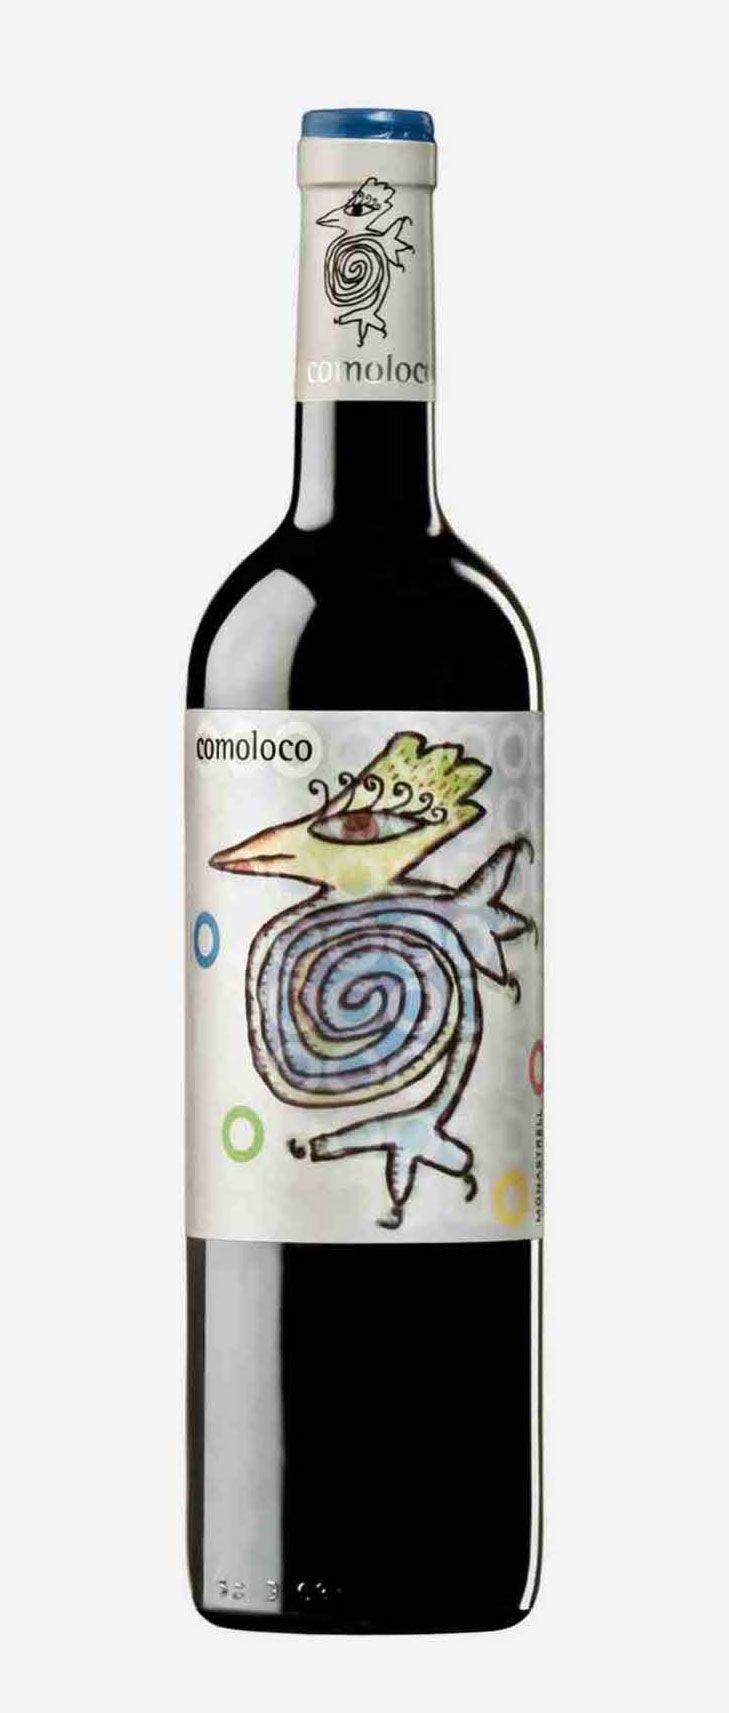 comoloco 2011 cute critter on this #wine #packaging PD wine / vinho / vino mxm